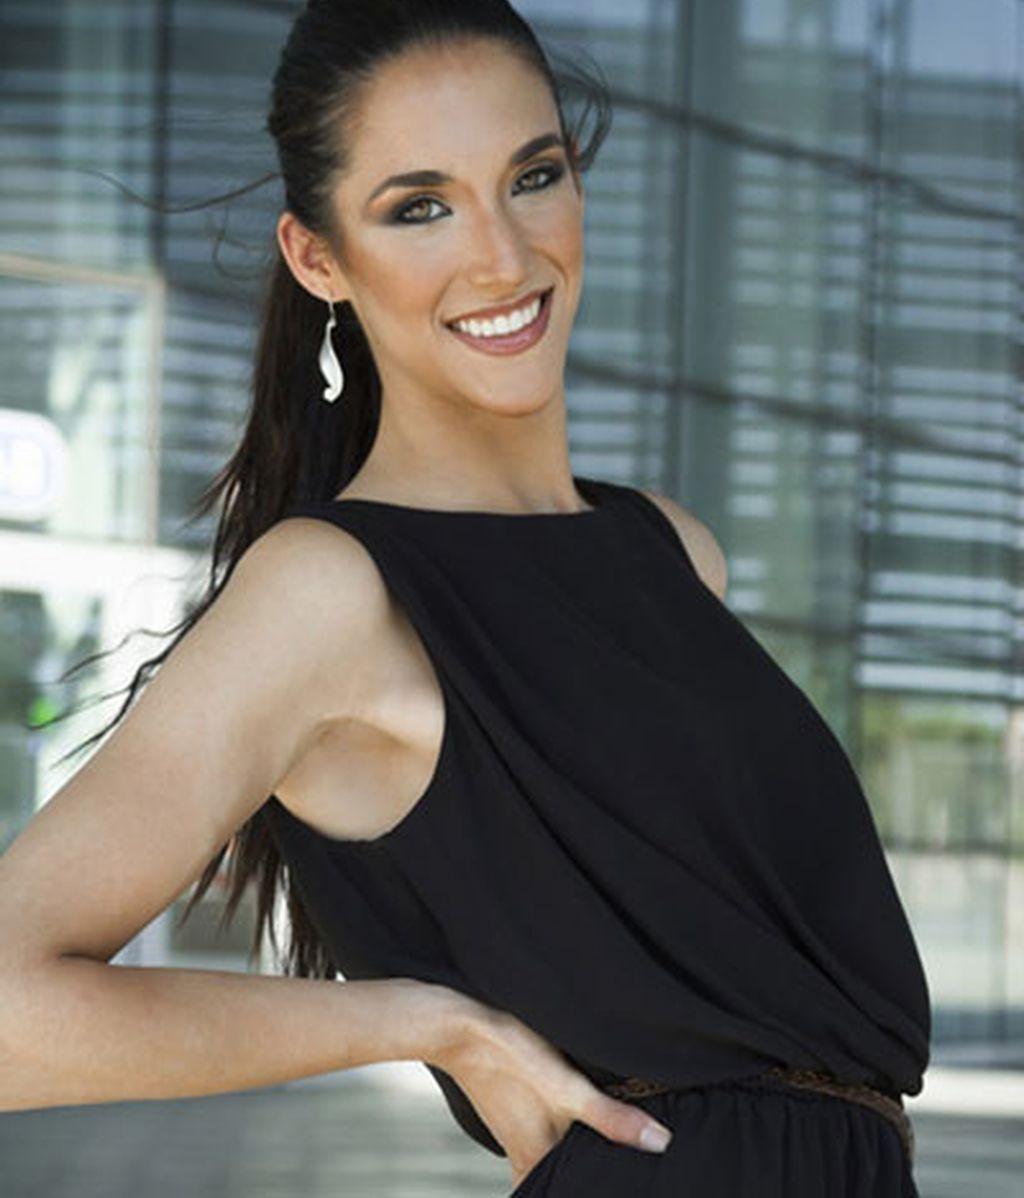 Inés Macarro Alzina, 23 años (Islas Baleares)